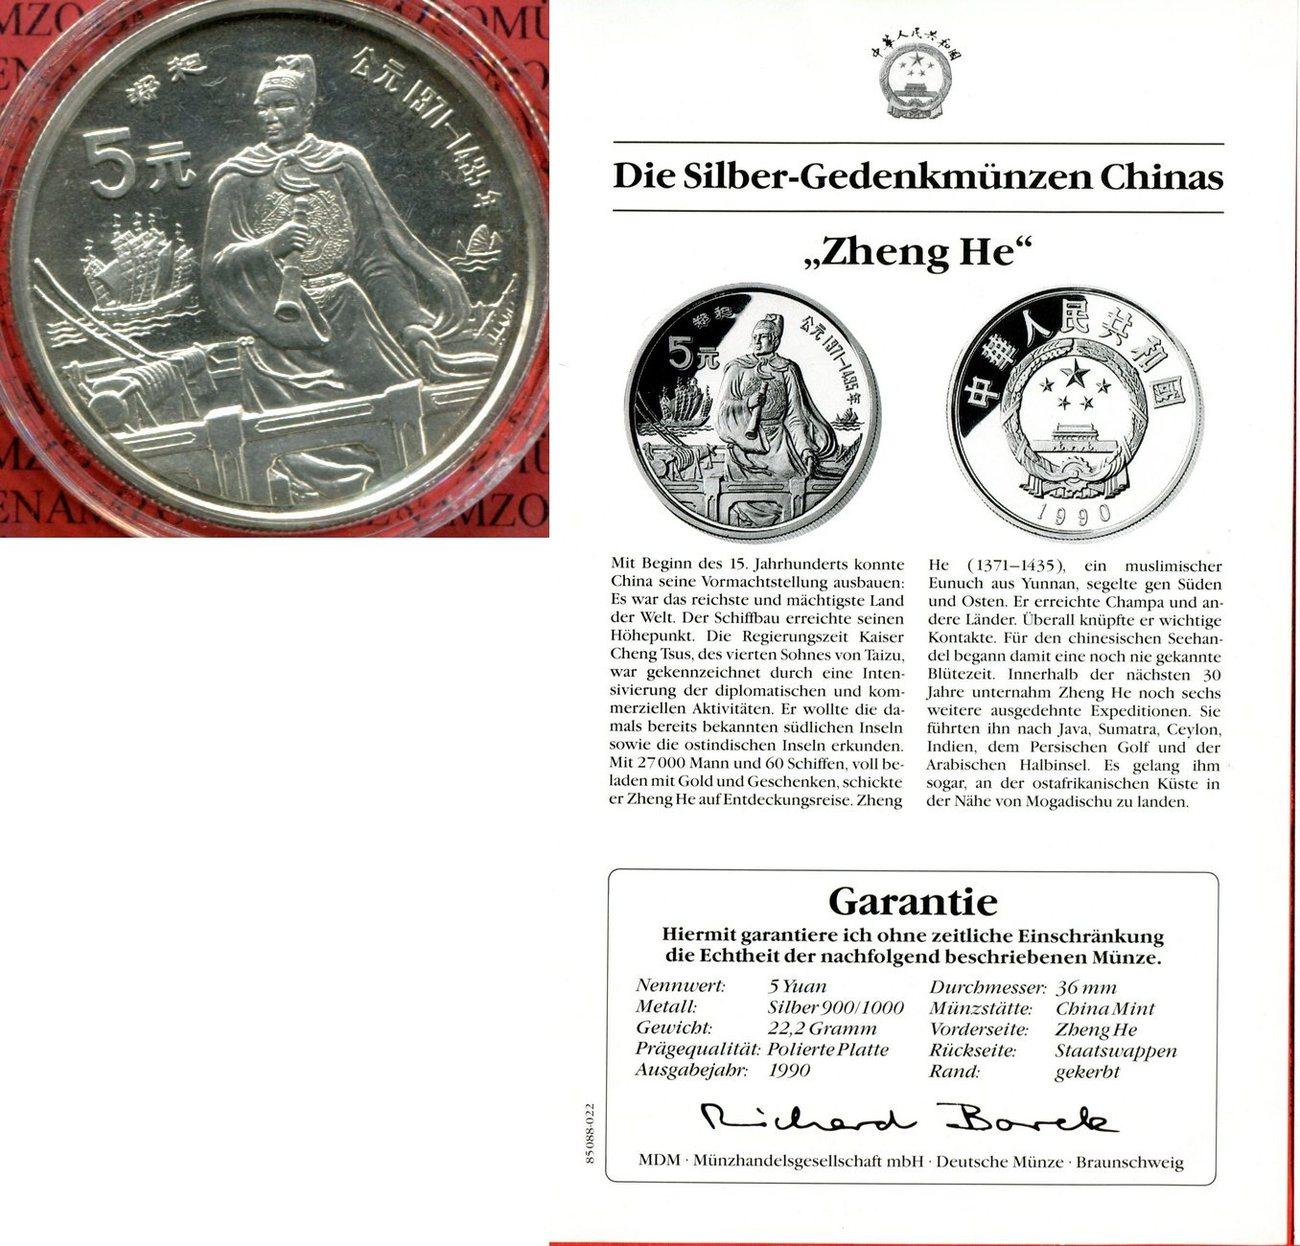 China 10 Yuan Silber Chancen messi ballon d zu gewinnen oder 1991 bwin zurückziehen Bonus bwin wetten app Gedenkmünze Mark Twain proof with capsule ...